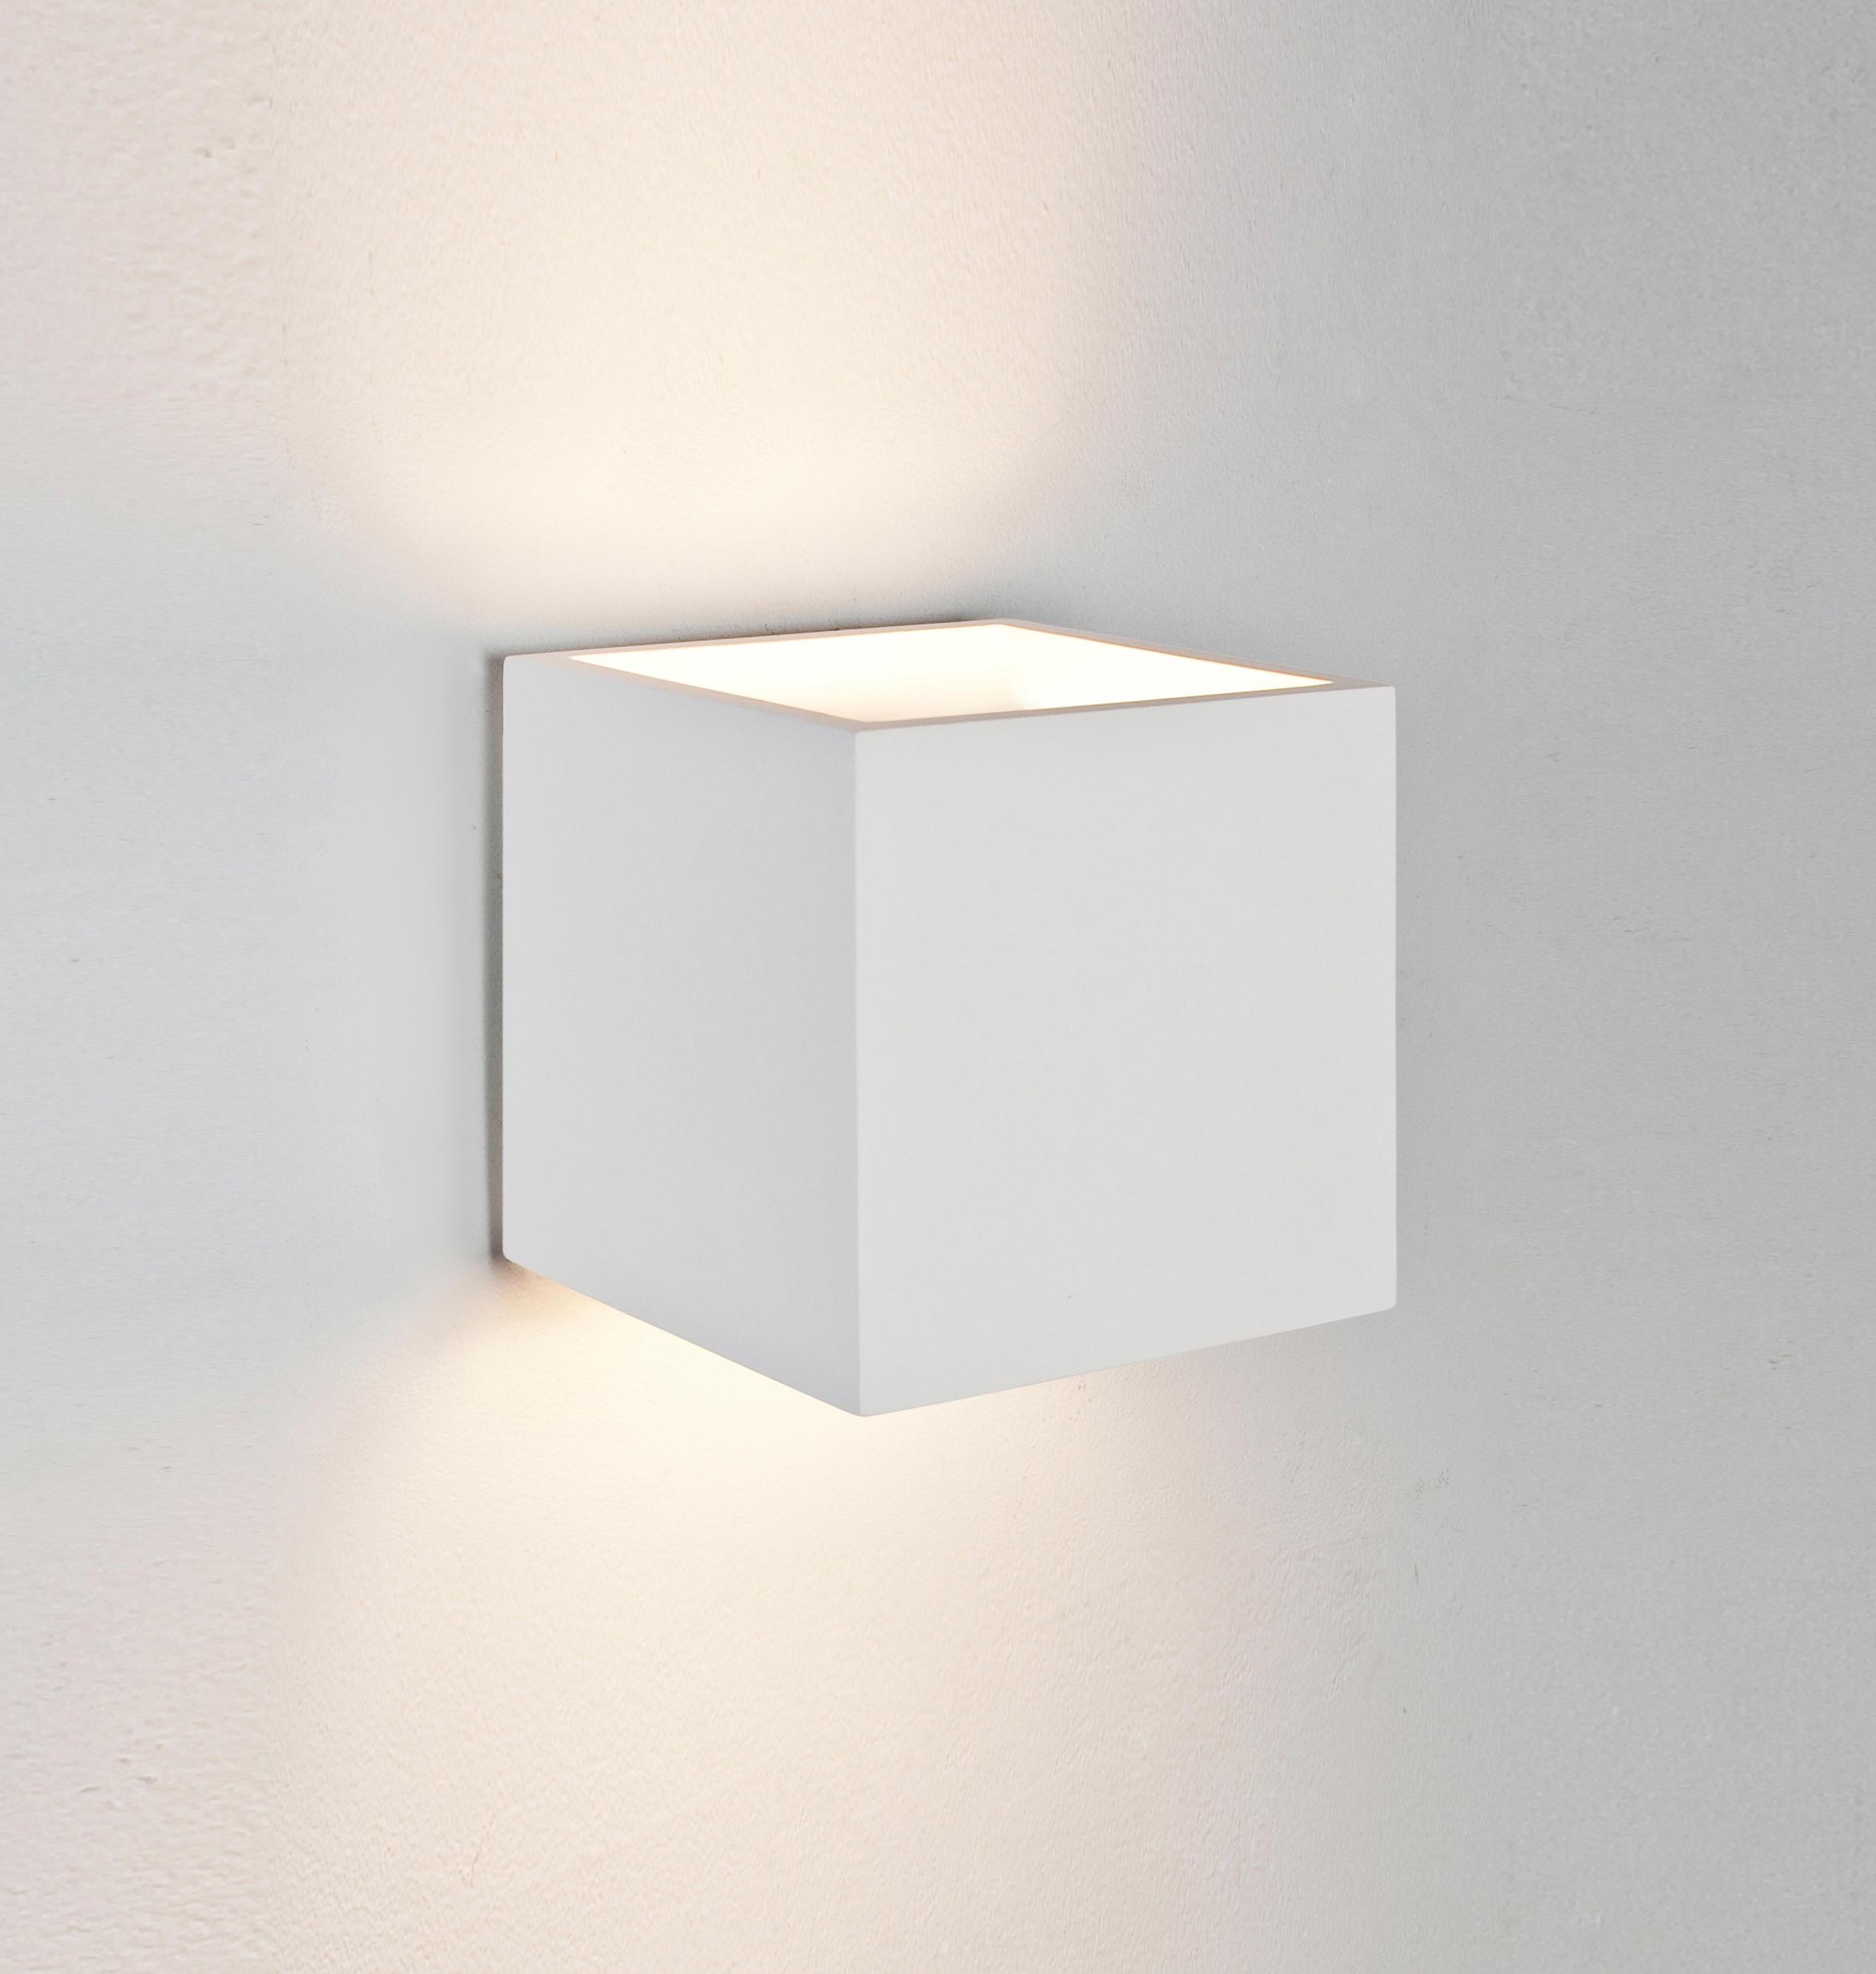 Pienza 165 By Astro Lighting